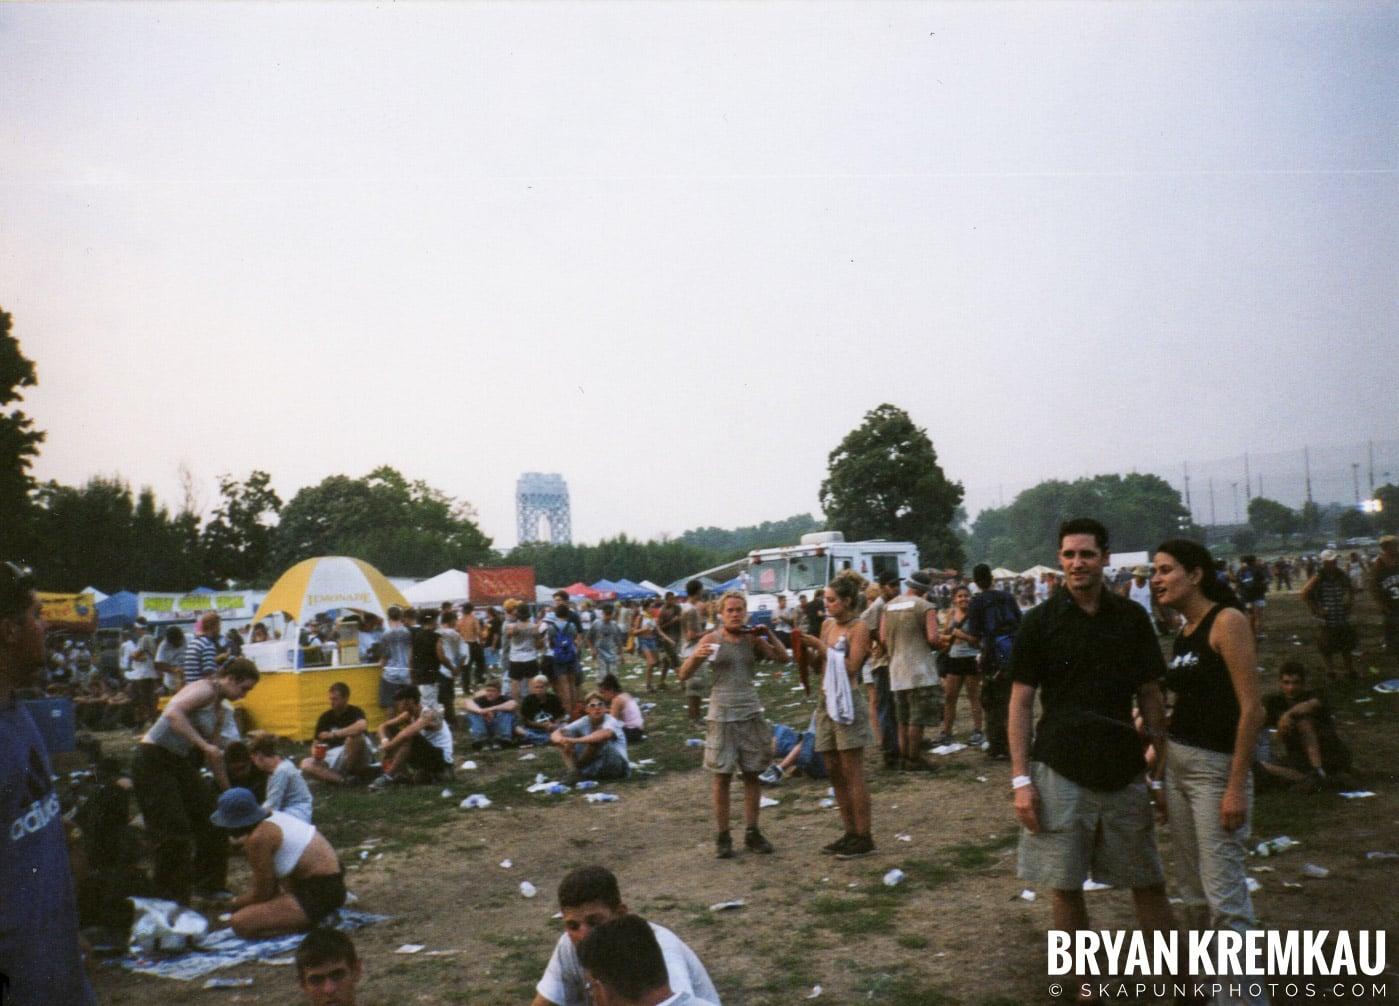 Crowd Shots @ Vans Warped Tour, Randall's Island, NYC - 7.16.99 (5)